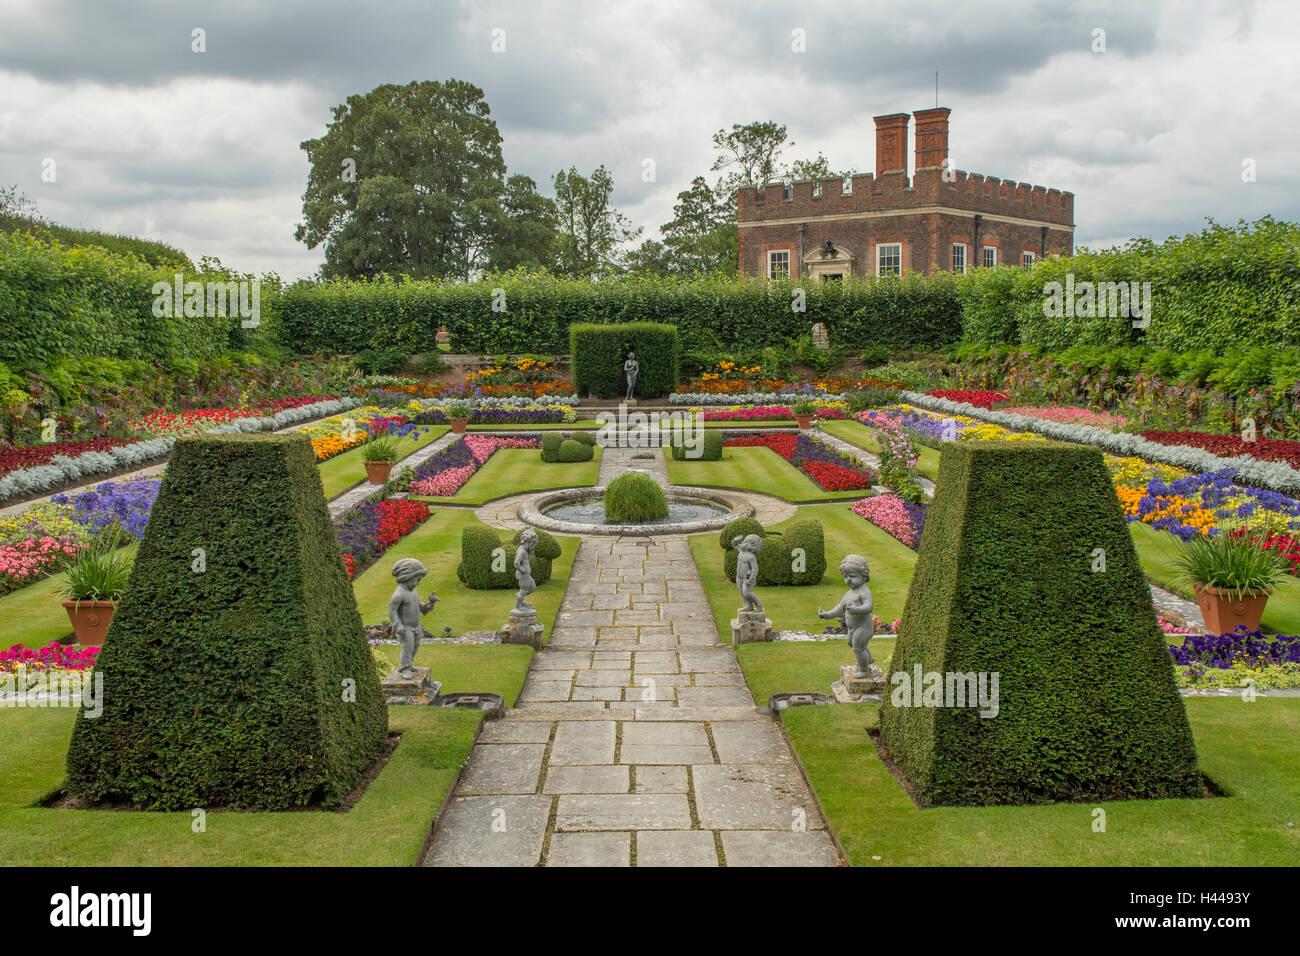 Pool garden hampton court palace richmond london for Richmond gardens pool